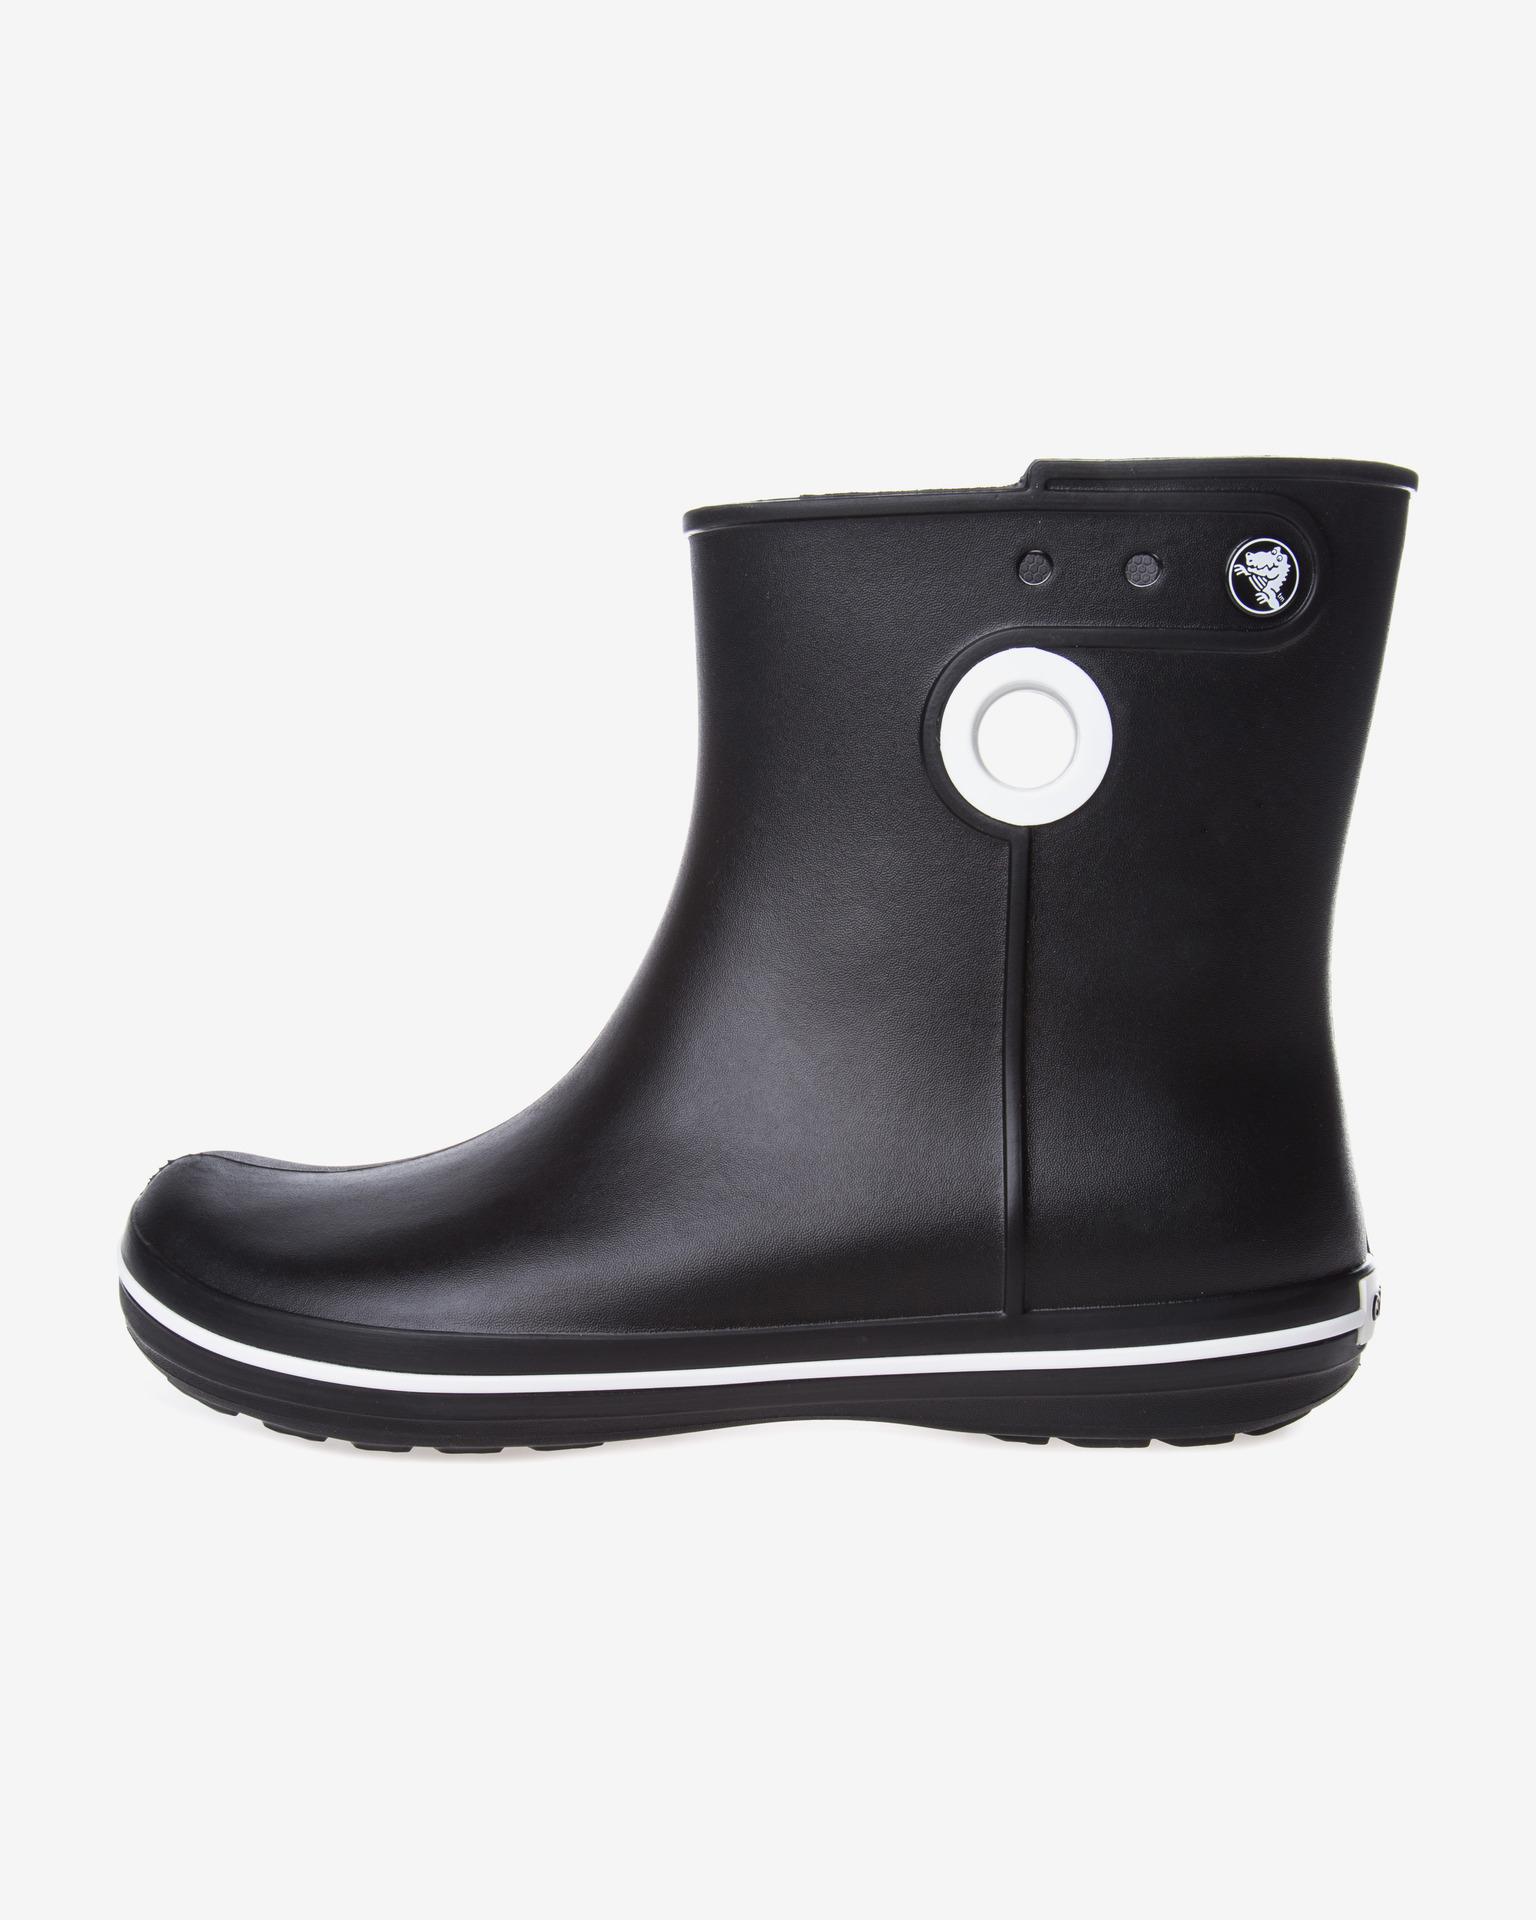 a6111b1e31f9d Crocs - Jaunt Shorty Gumene čizme